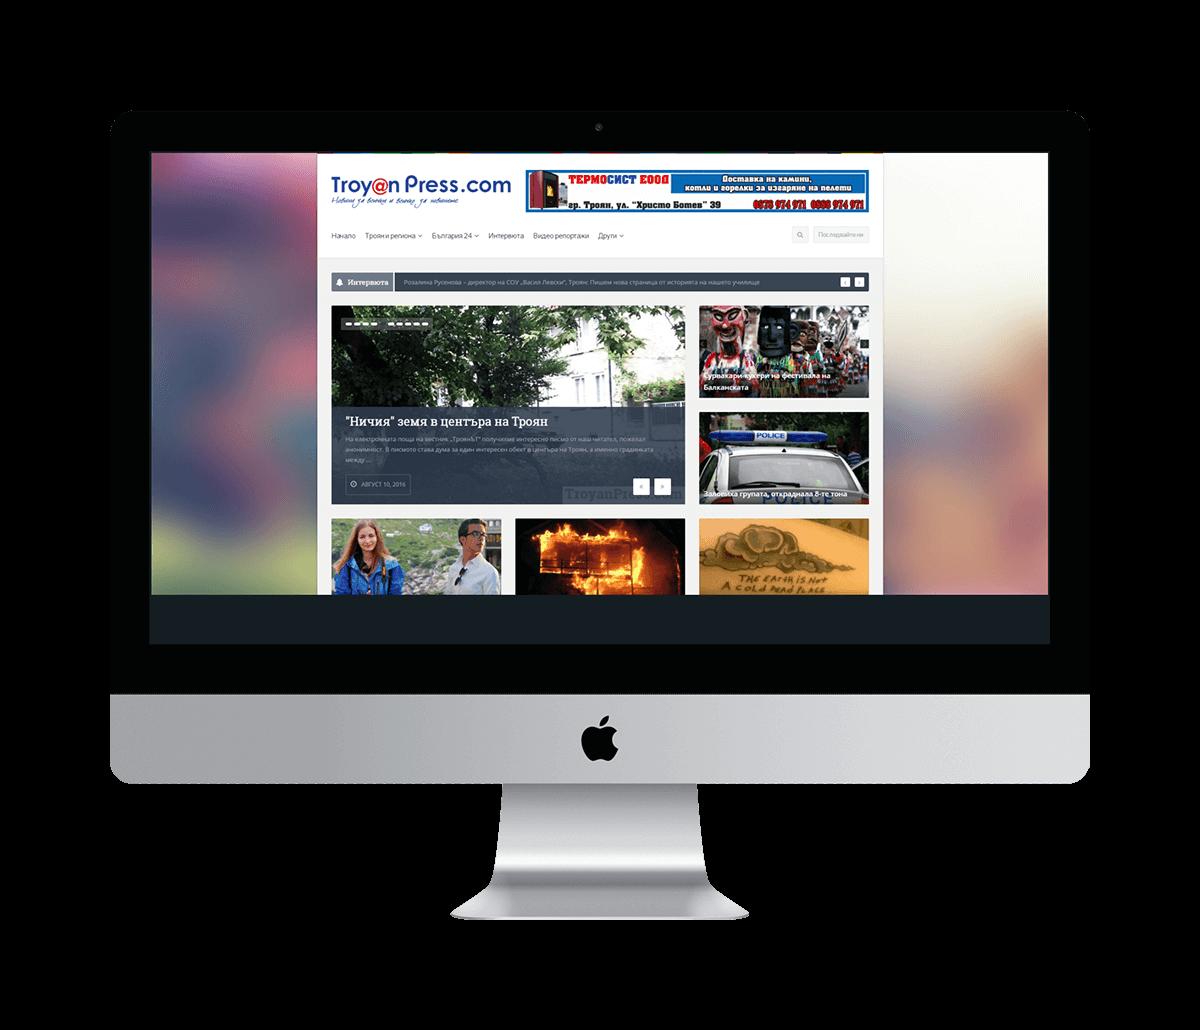 TroyanPress.com - Screenshot